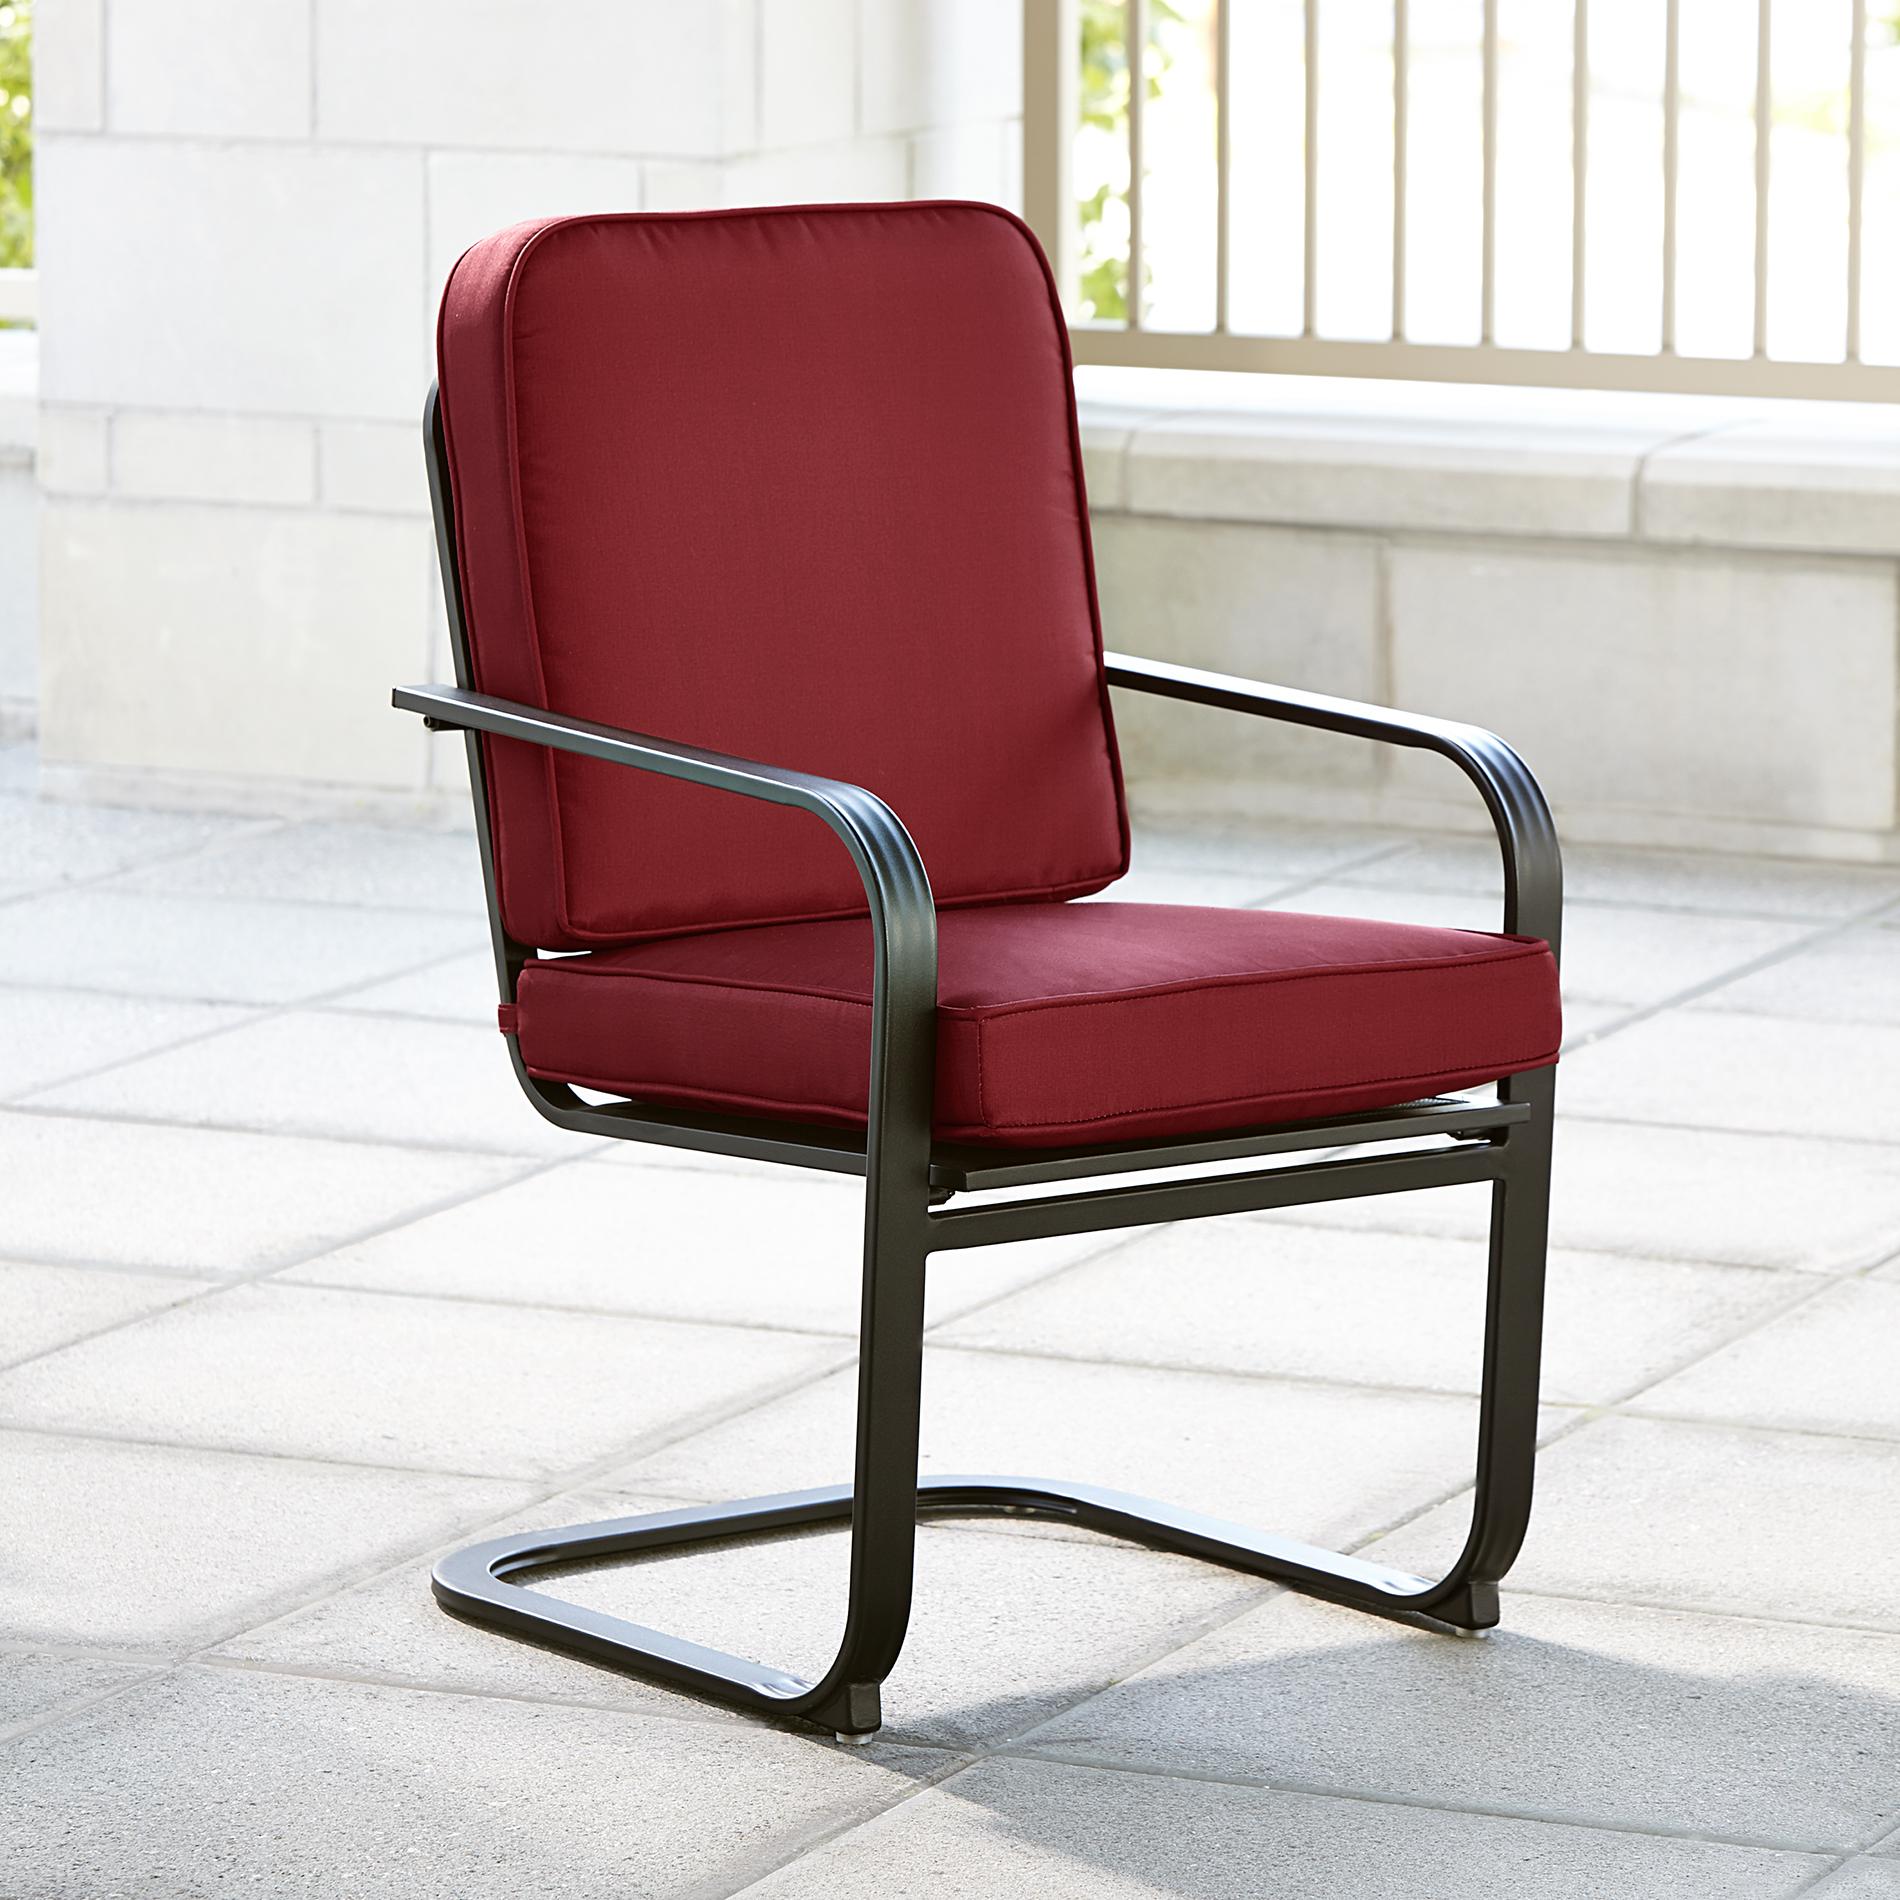 Essential Garden Bisbee Single Dining Chair Red  Outdoor